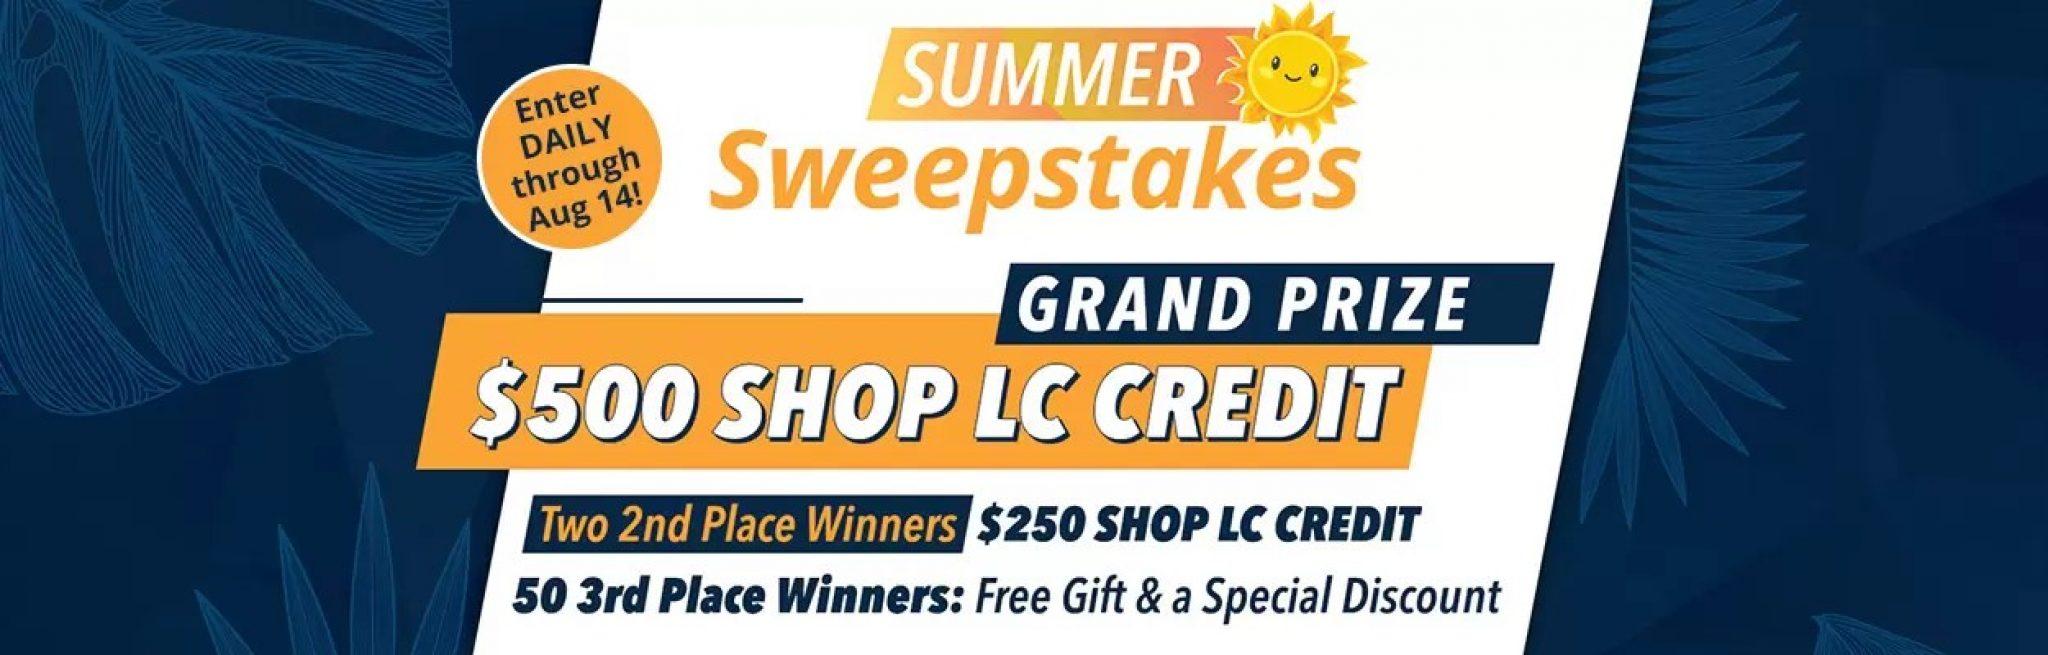 ShopLC End of Summer Giveaway - 2021-08-14 ...